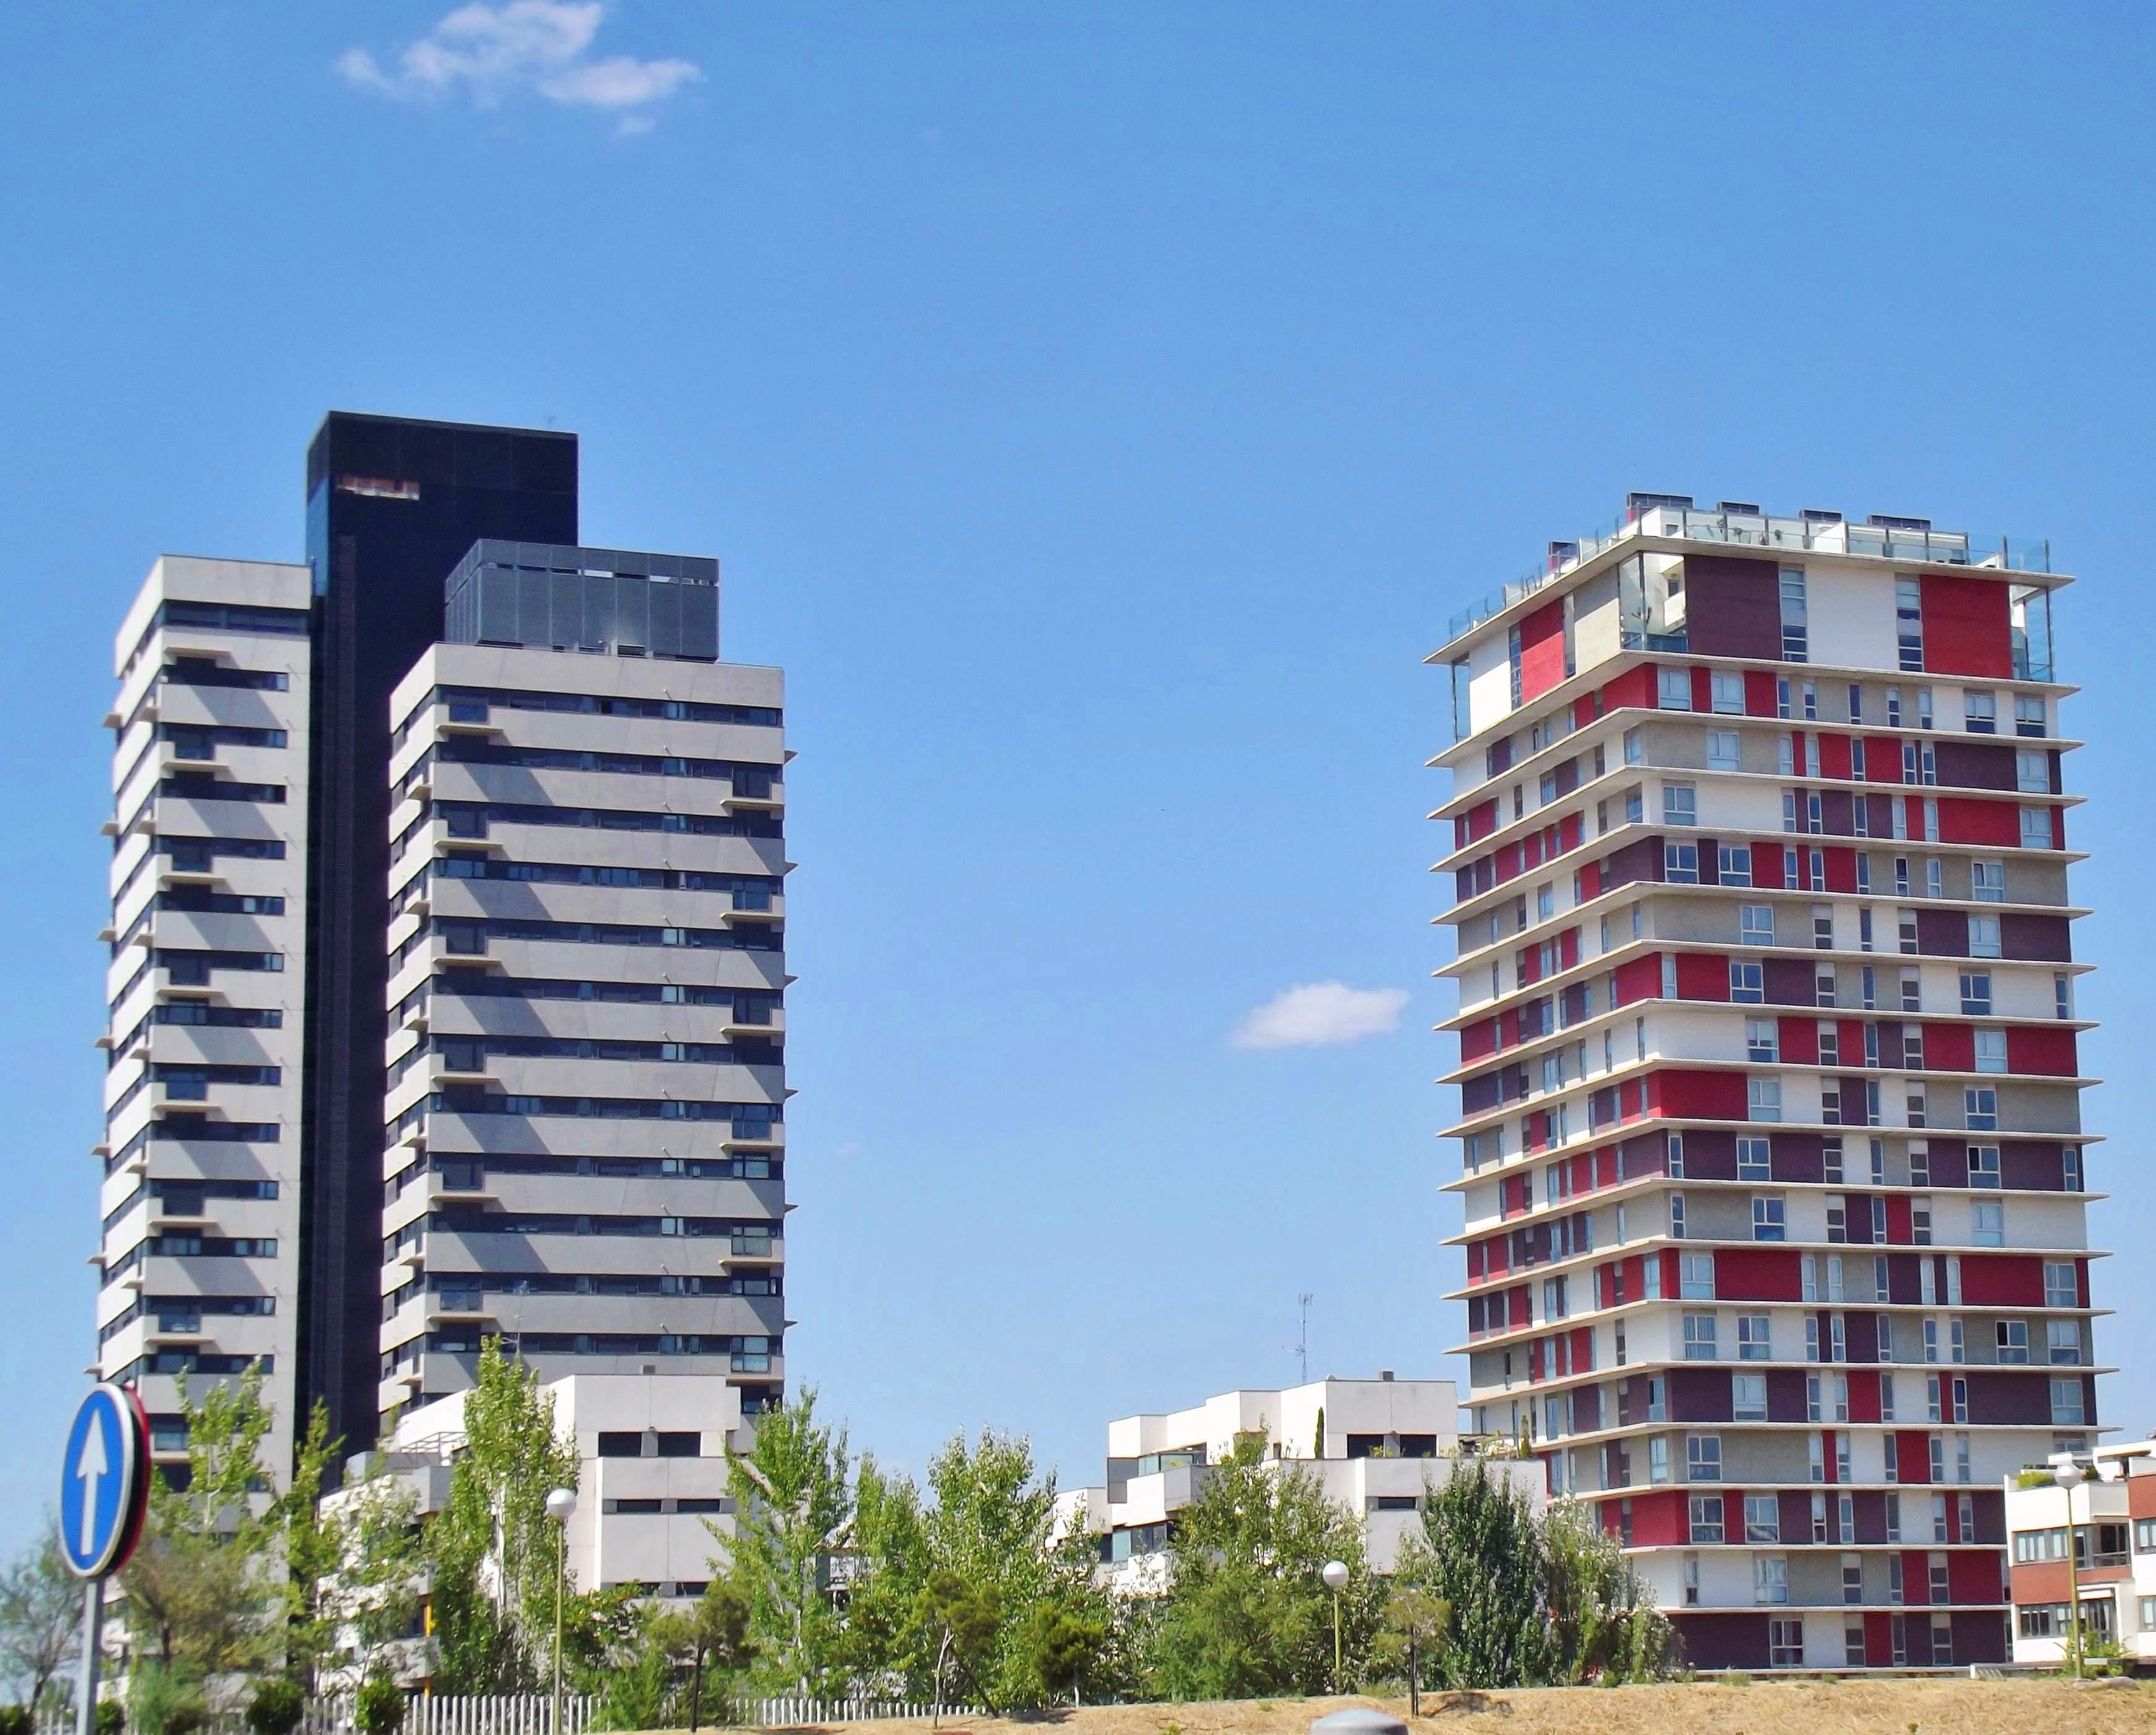 File:Torre Puerta de Chamartín y Torre Panorama (2).jpg - Wikimedia ...